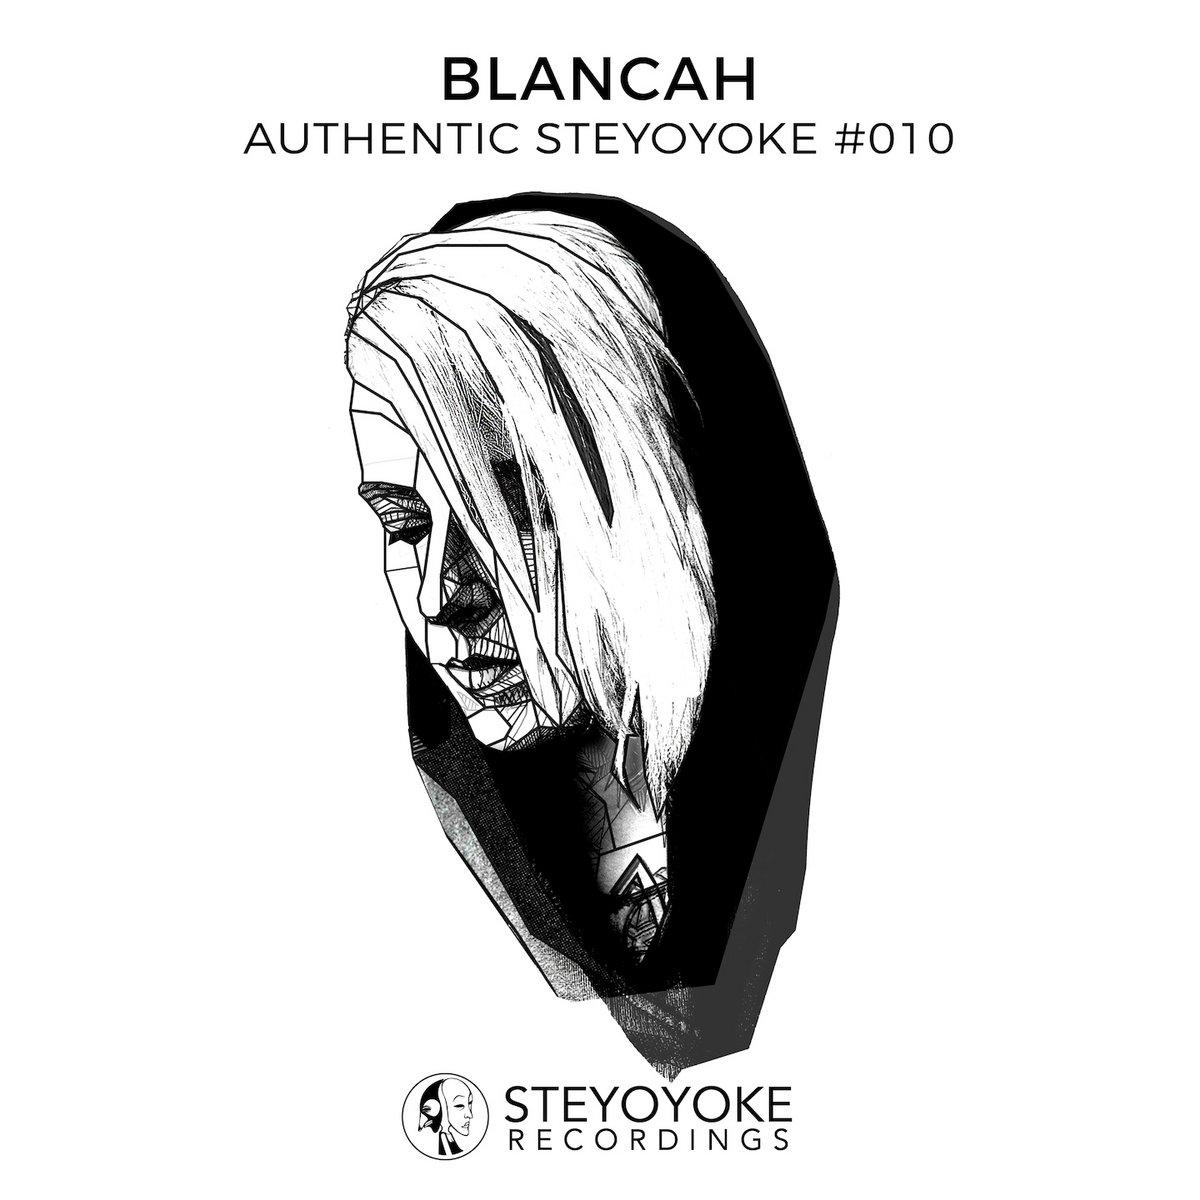 BLANCAh Presents Authentic Steyoyoke #010 | Steyoyoke